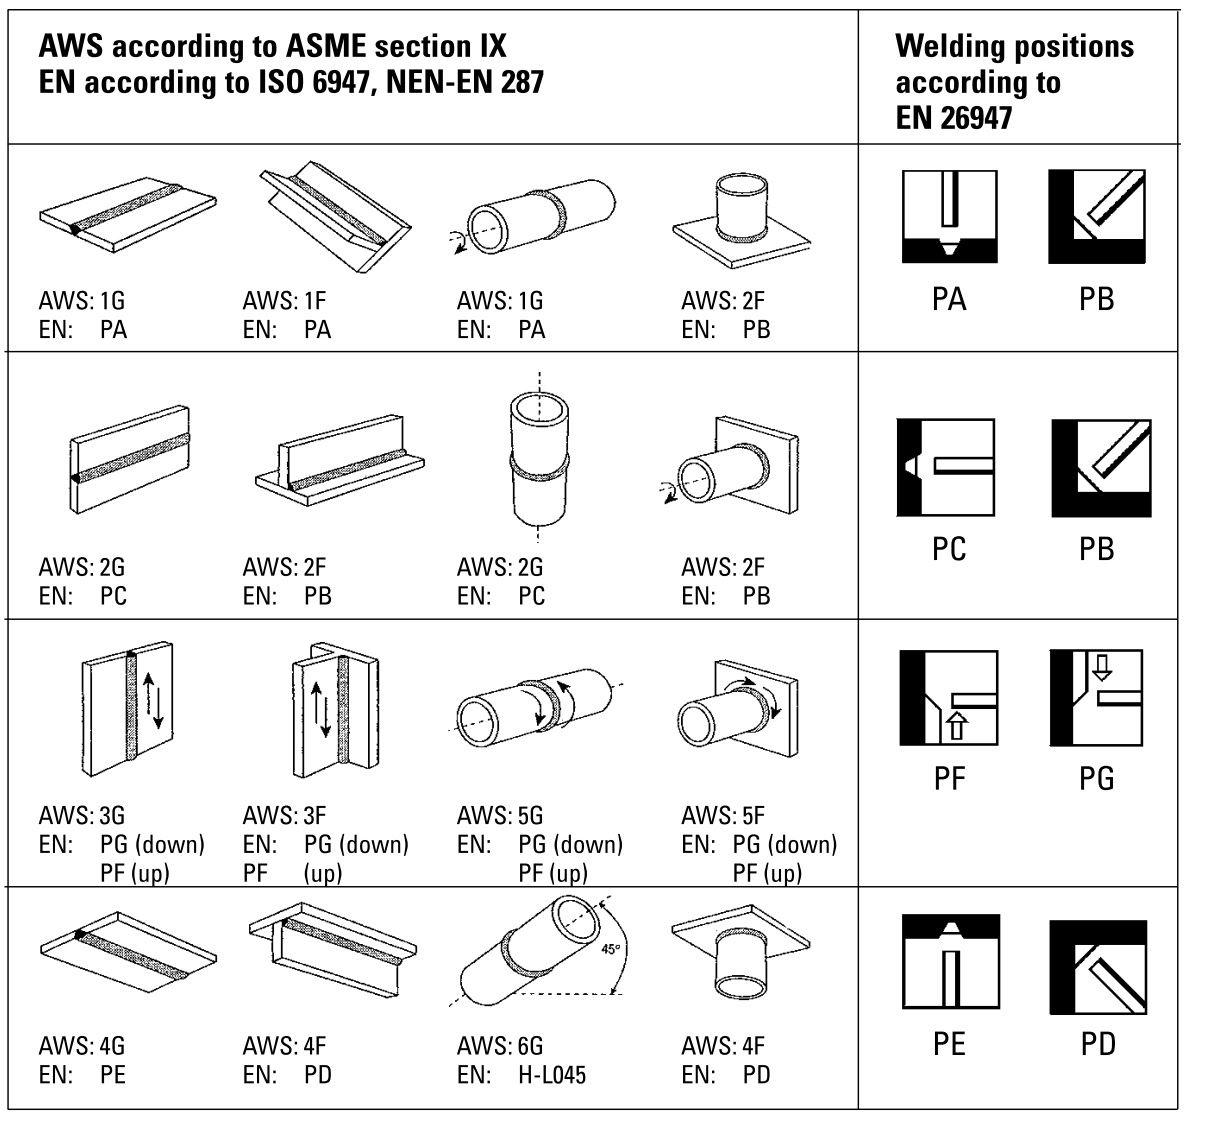 medium resolution of hasil gambar untuk 6g welding position model pinterest welding 2g pipe welding 6g welding position diagram